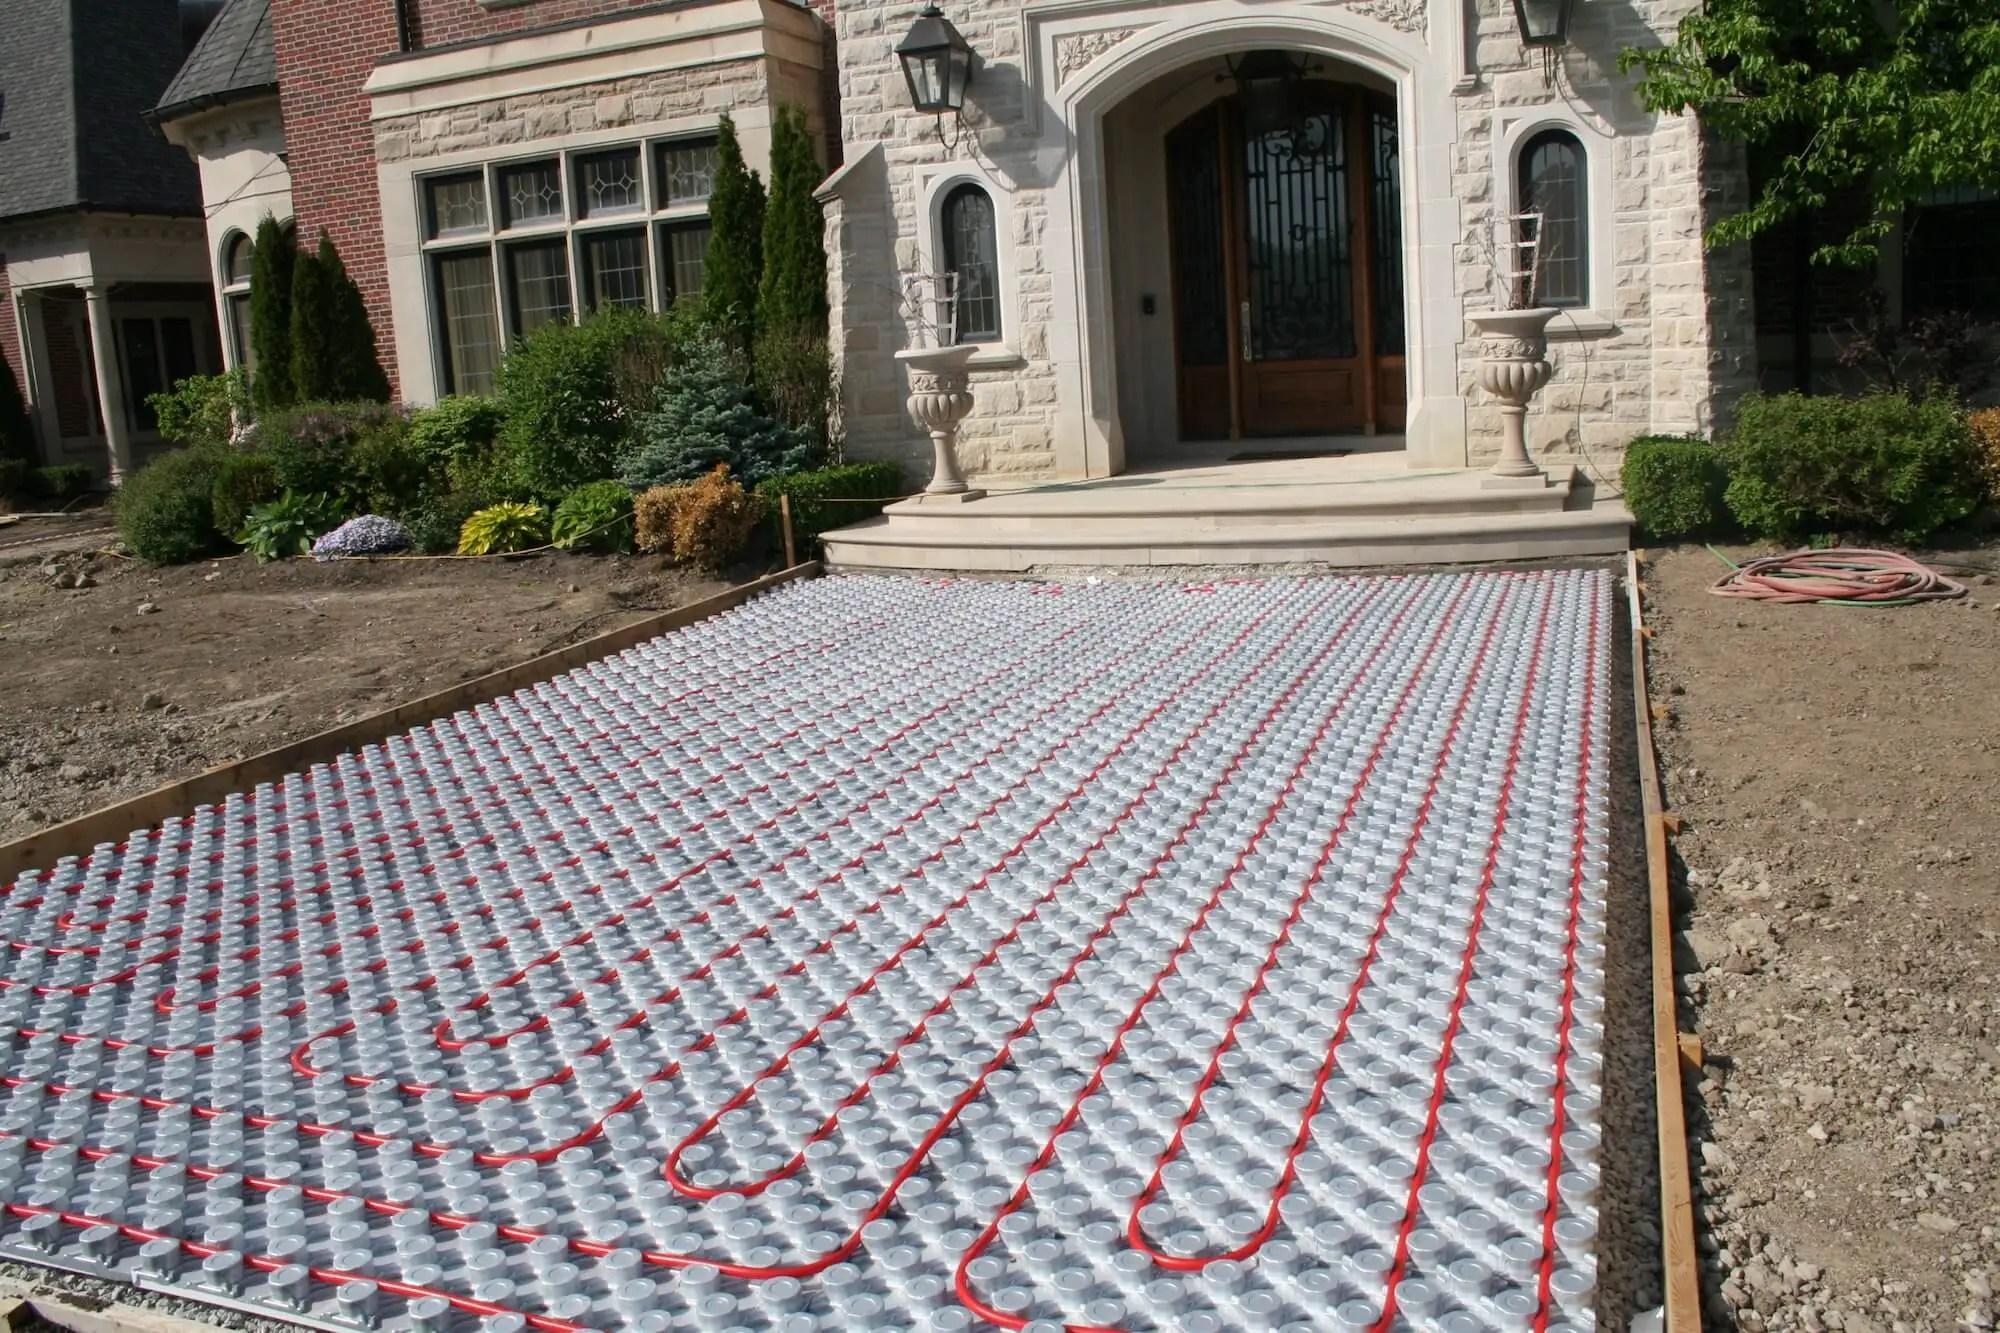 Driveway & Walkways: Outdoor Radiant Heating Panels